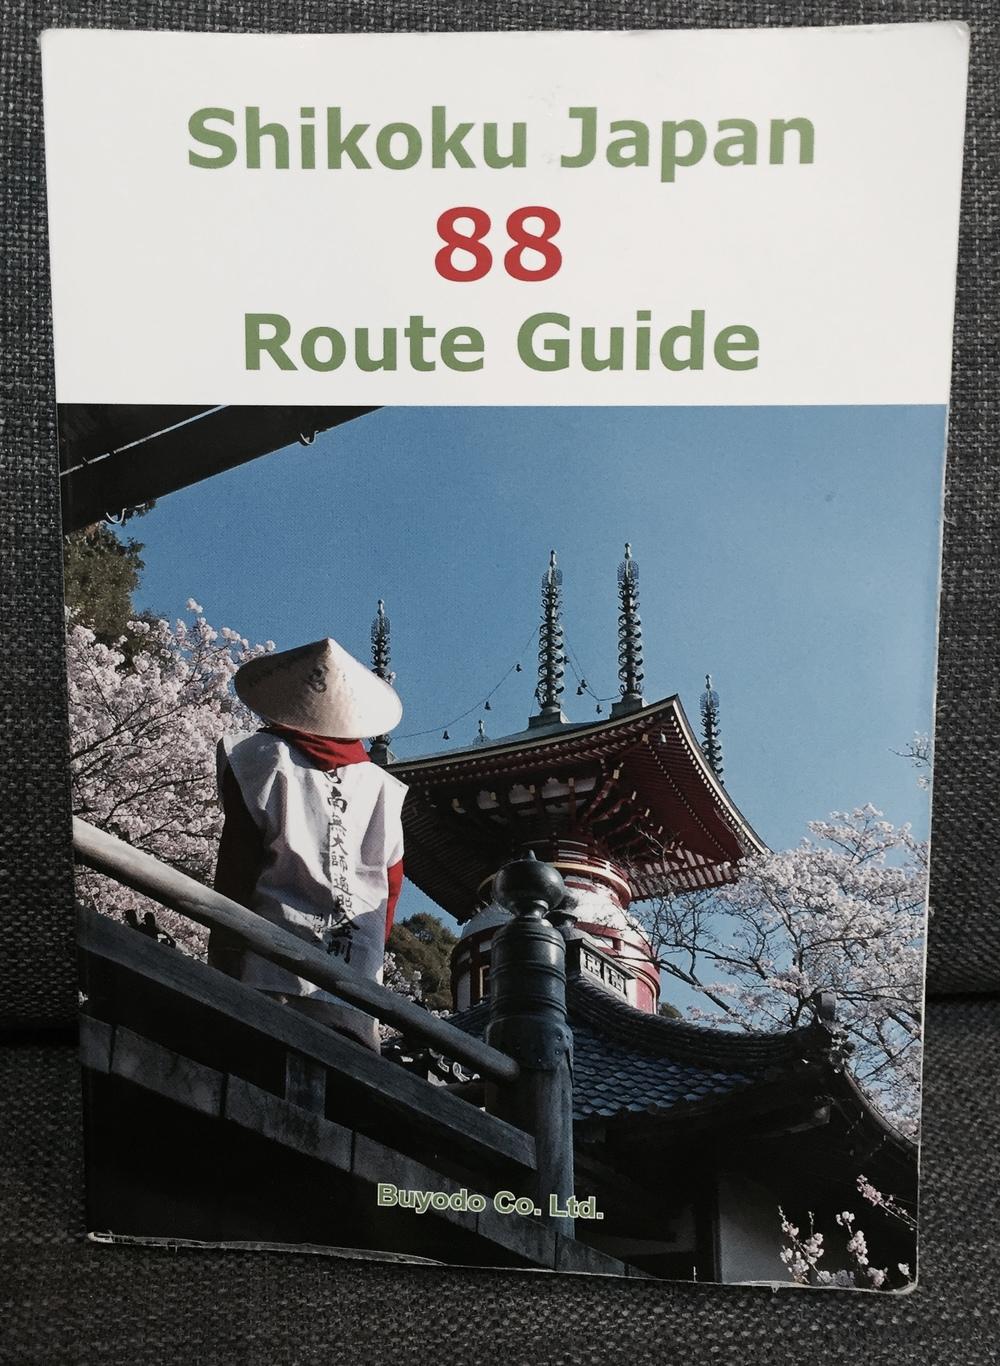 Shikoku Japan Route Guide